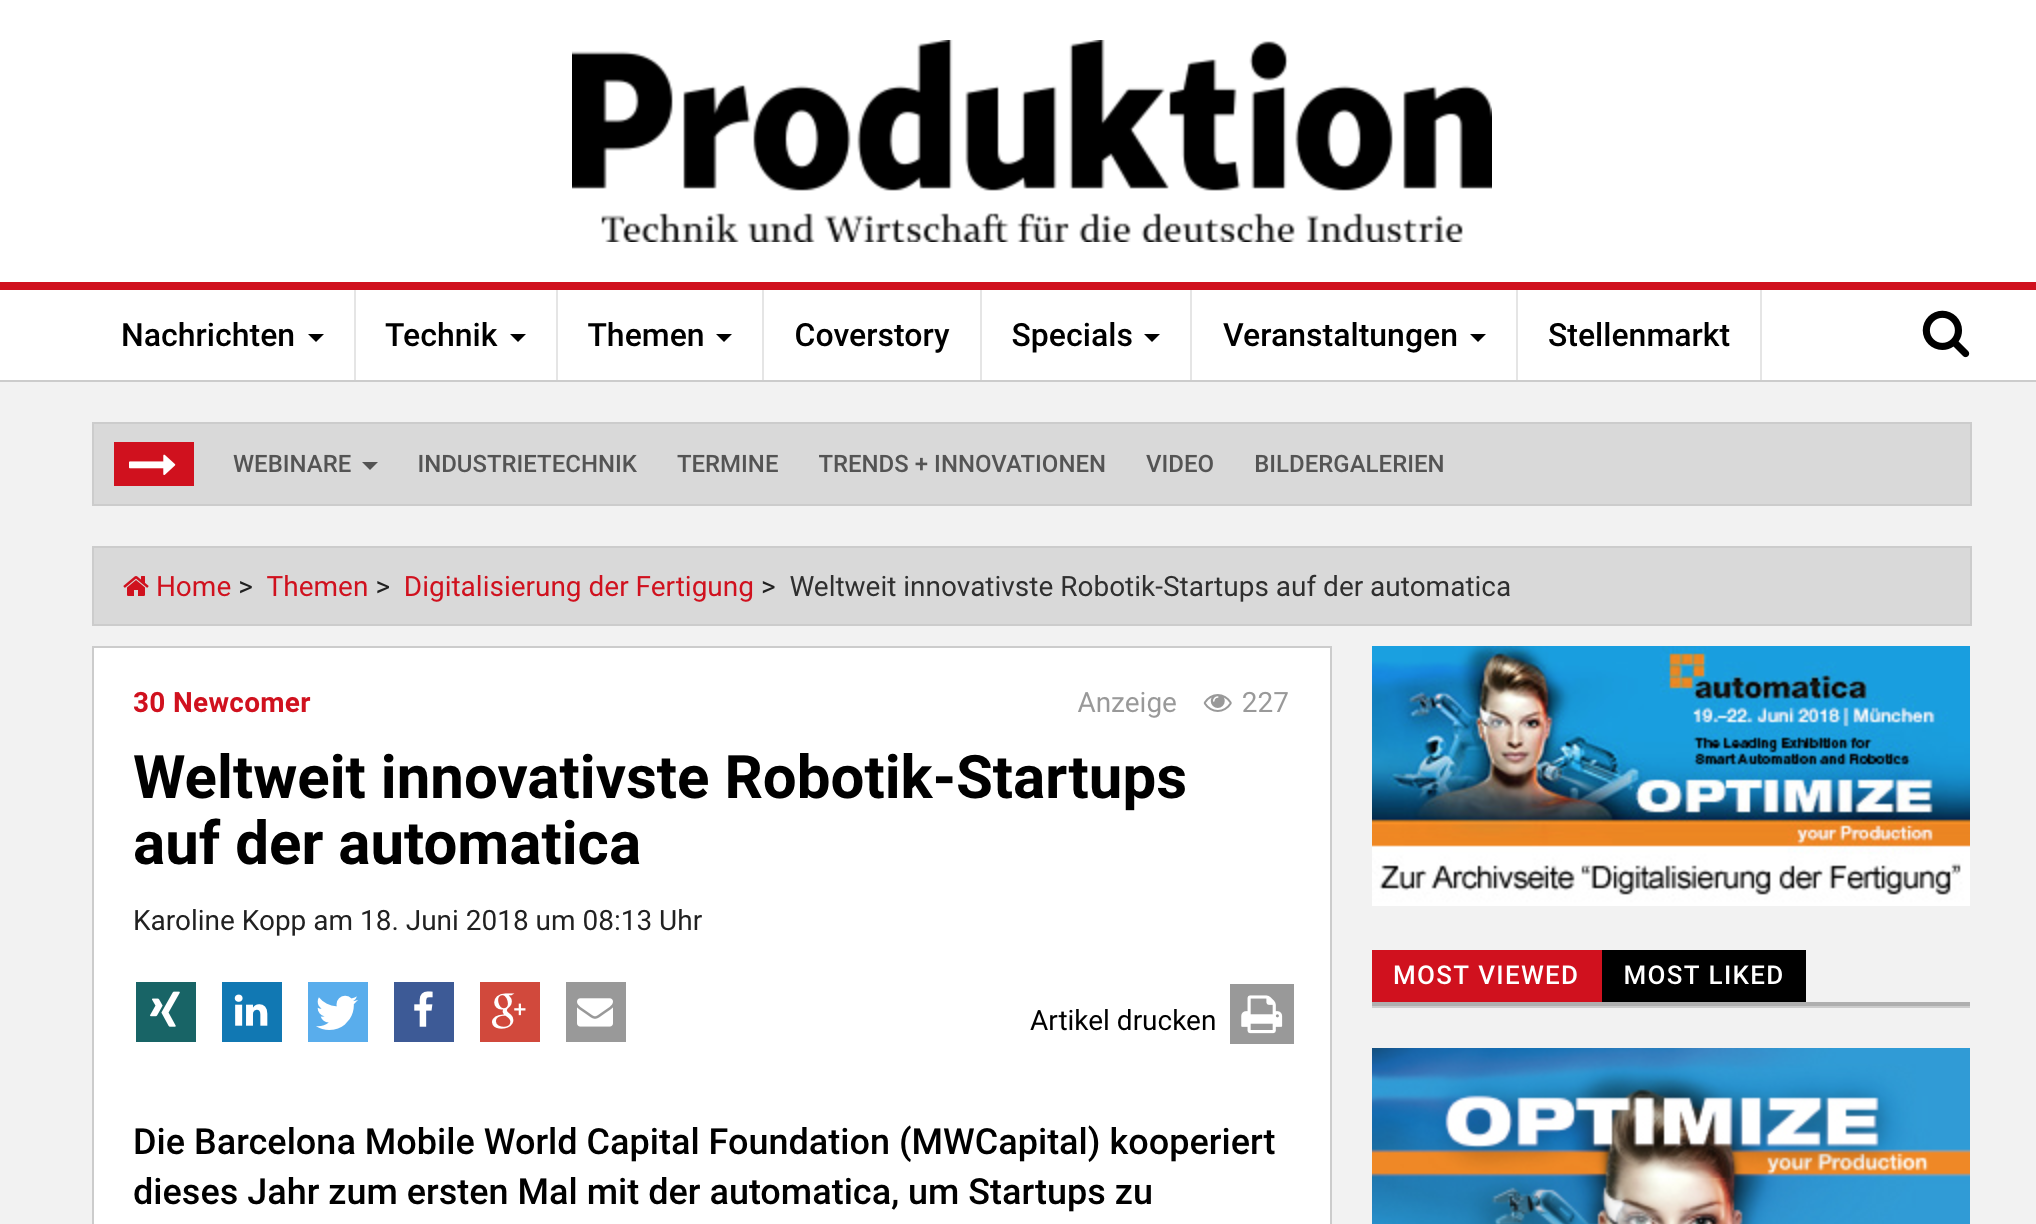 Automatica weltweit innovativste startups gerotor